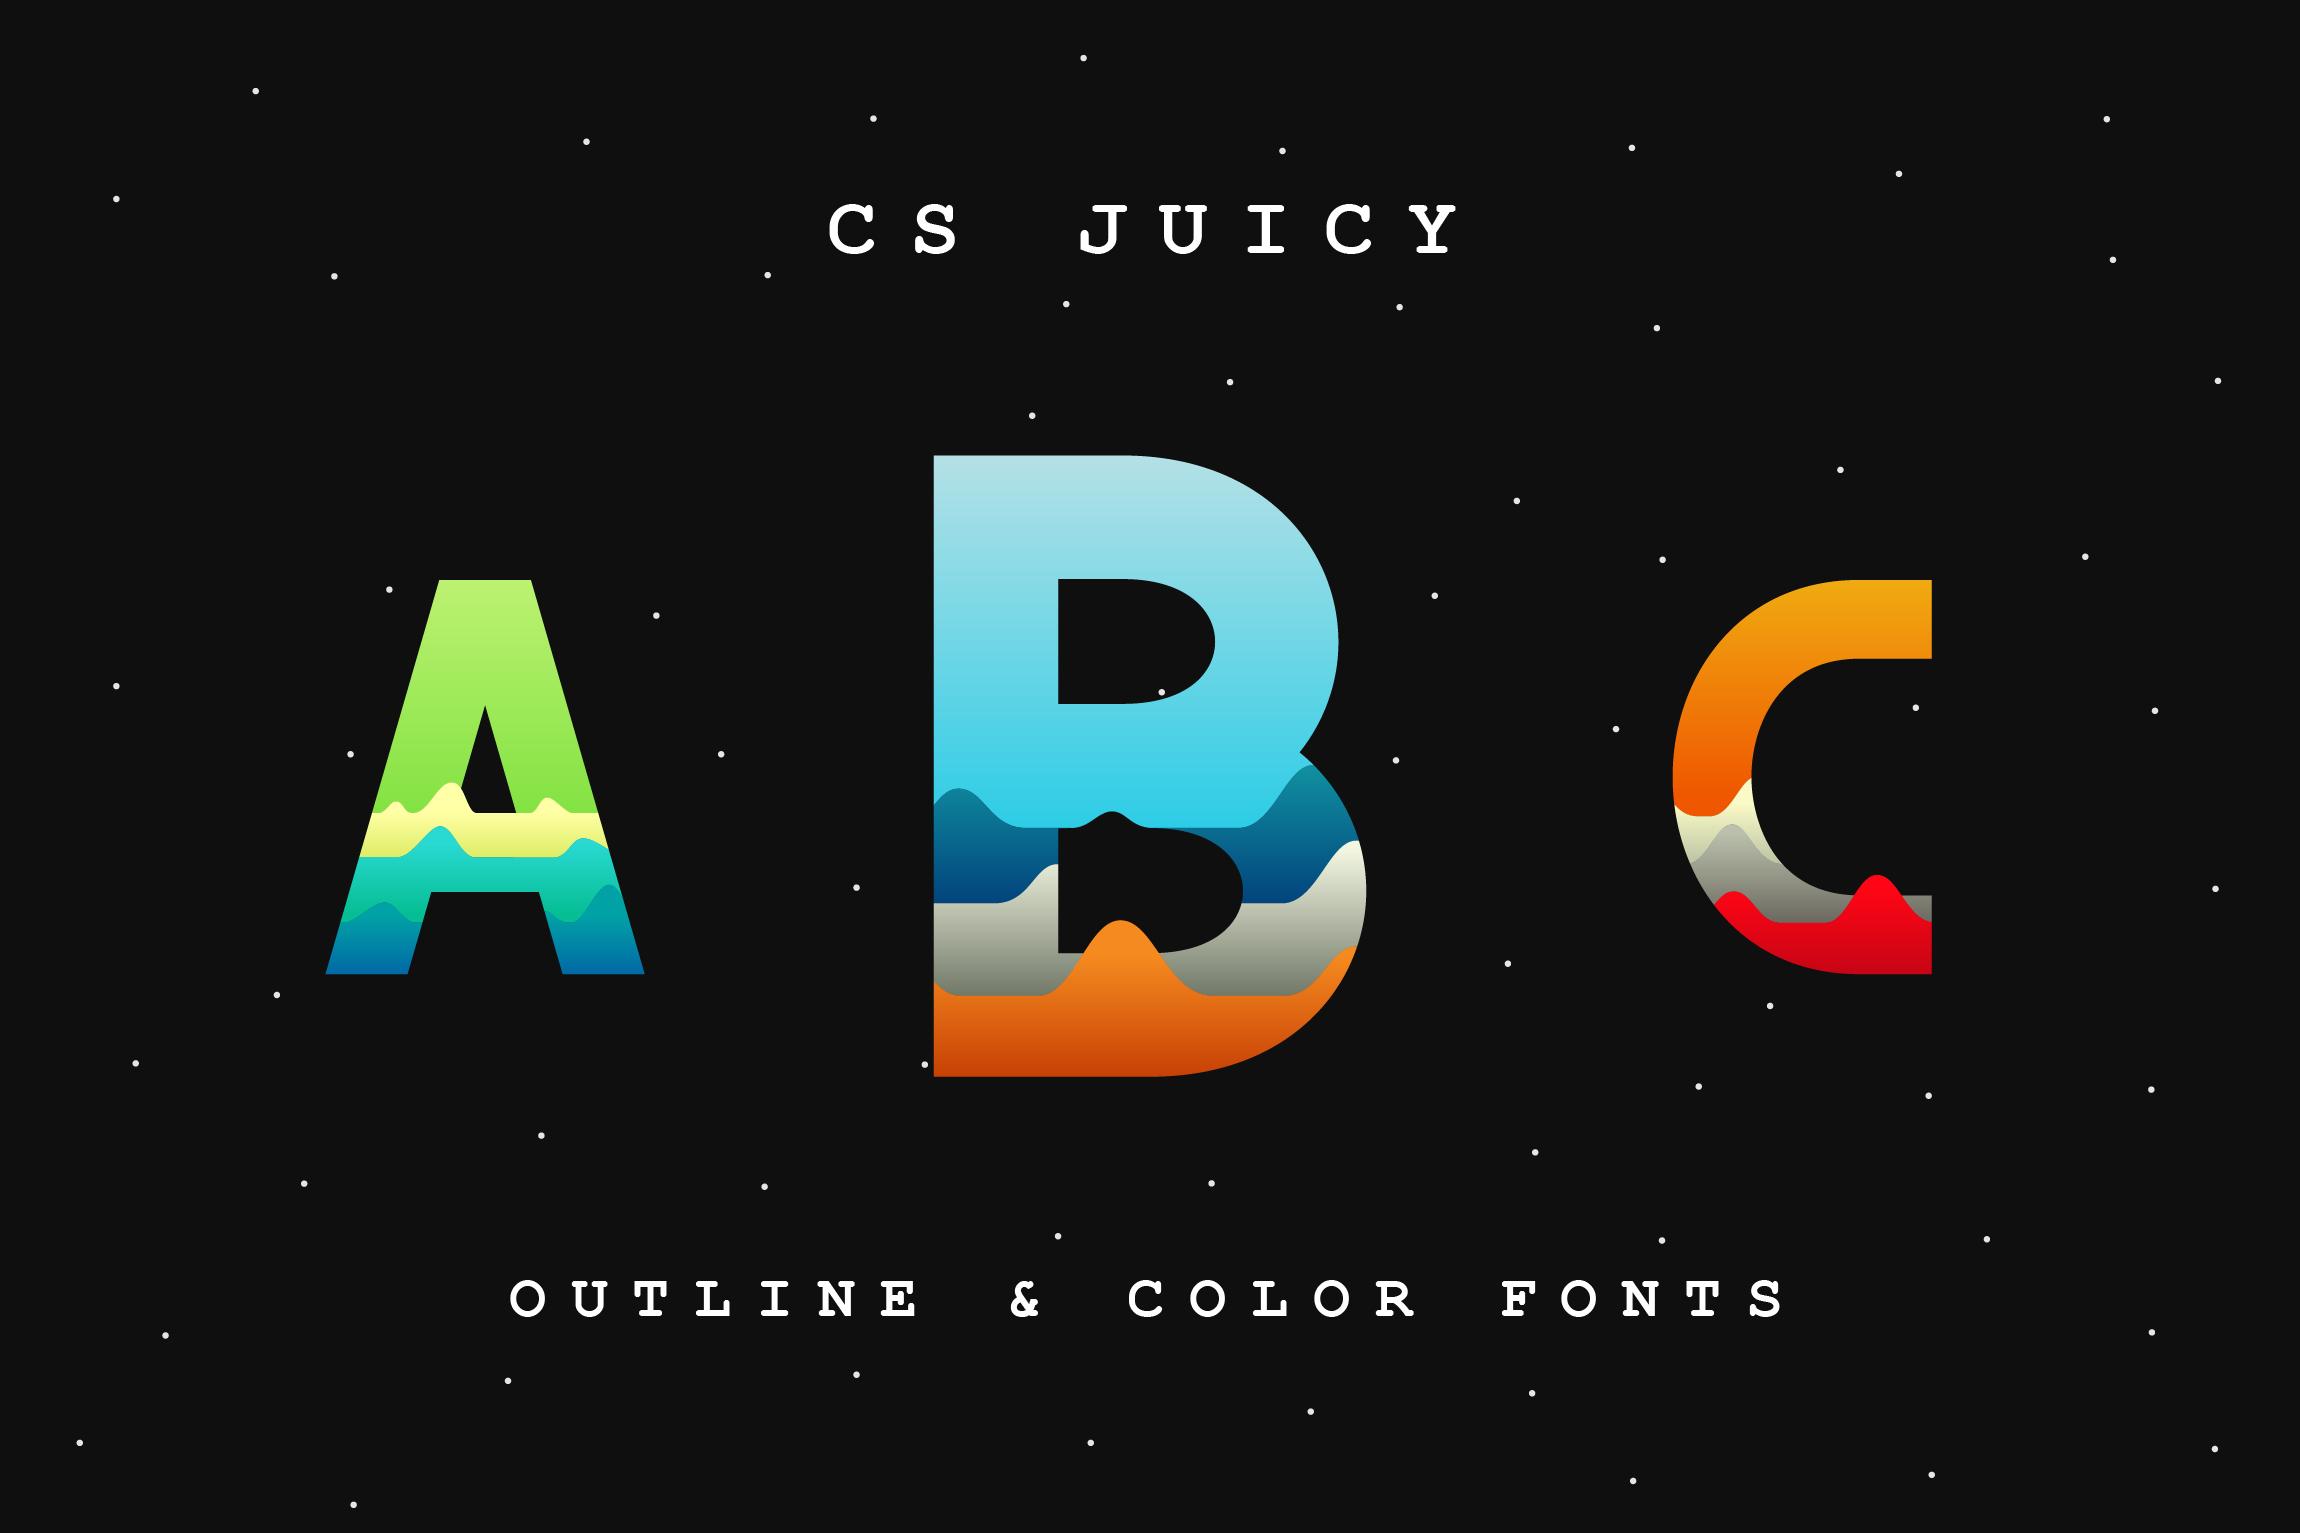 CS Juicy (Color Font & Outline) example image 1